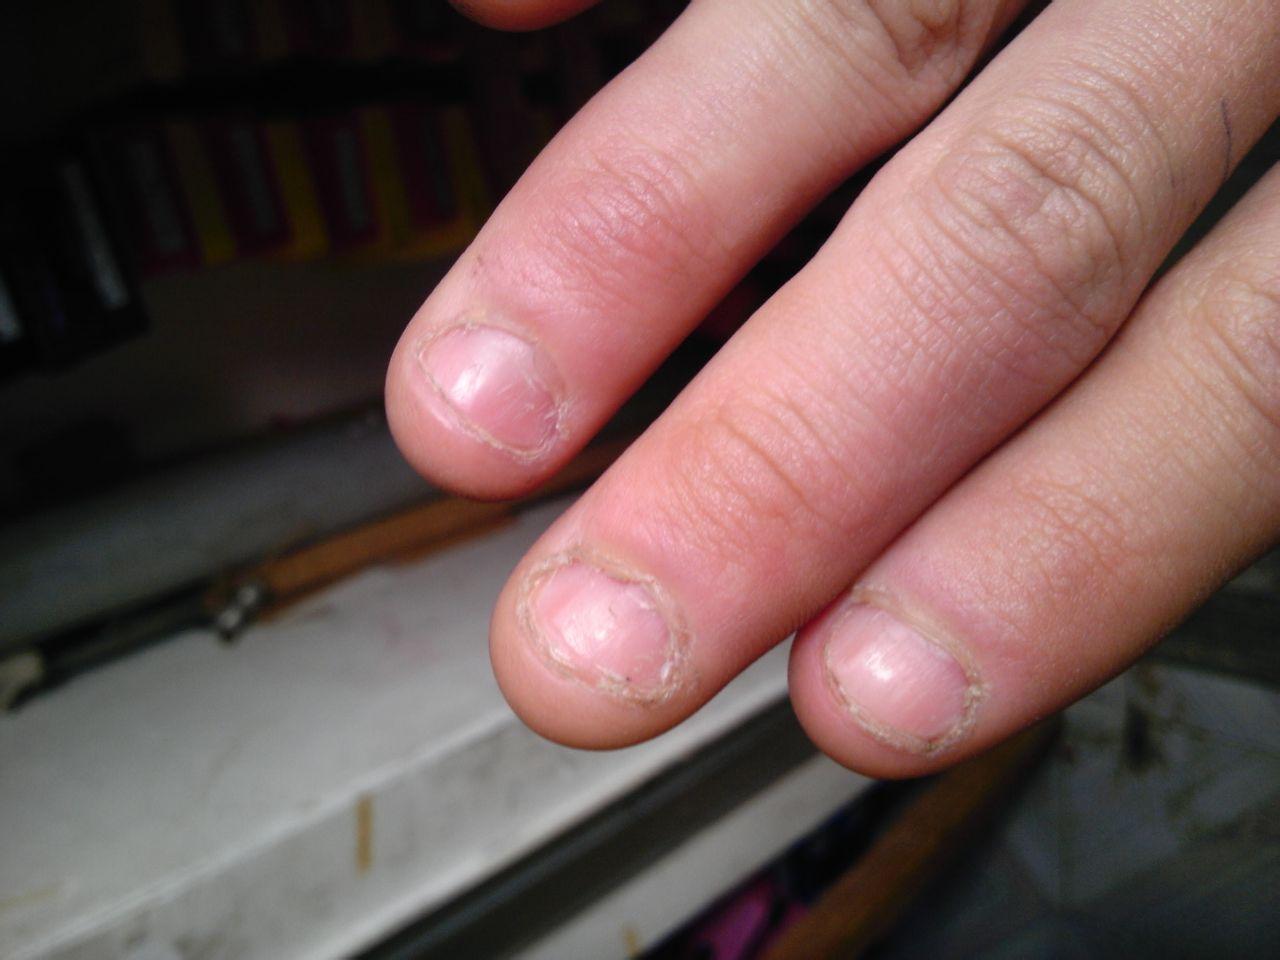 手指甲爛爛的怎么辦圖片